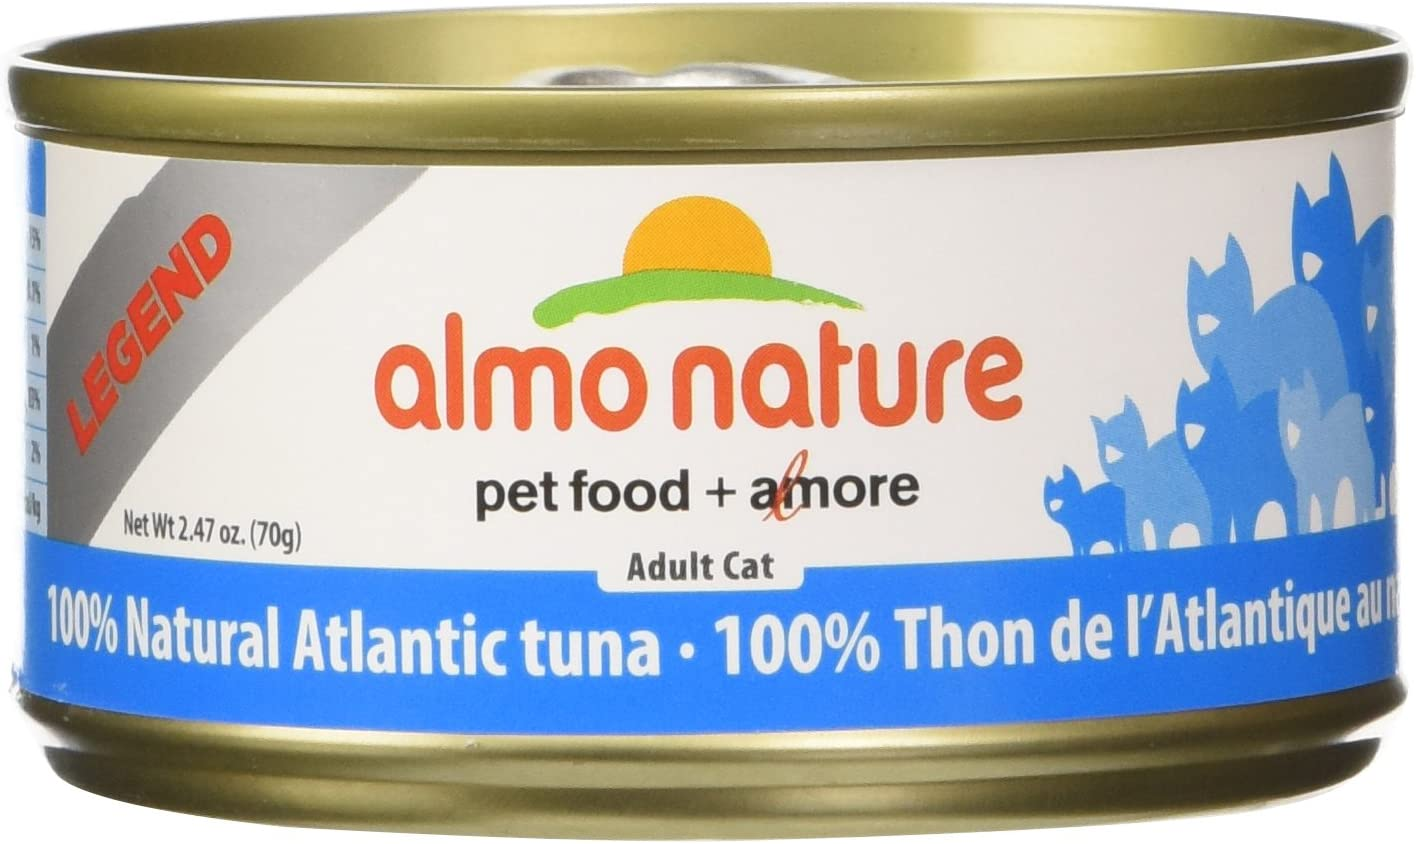 Almo Nature Atlantic Tuna Food (24 Cans Per Case), 2.47 Oz.